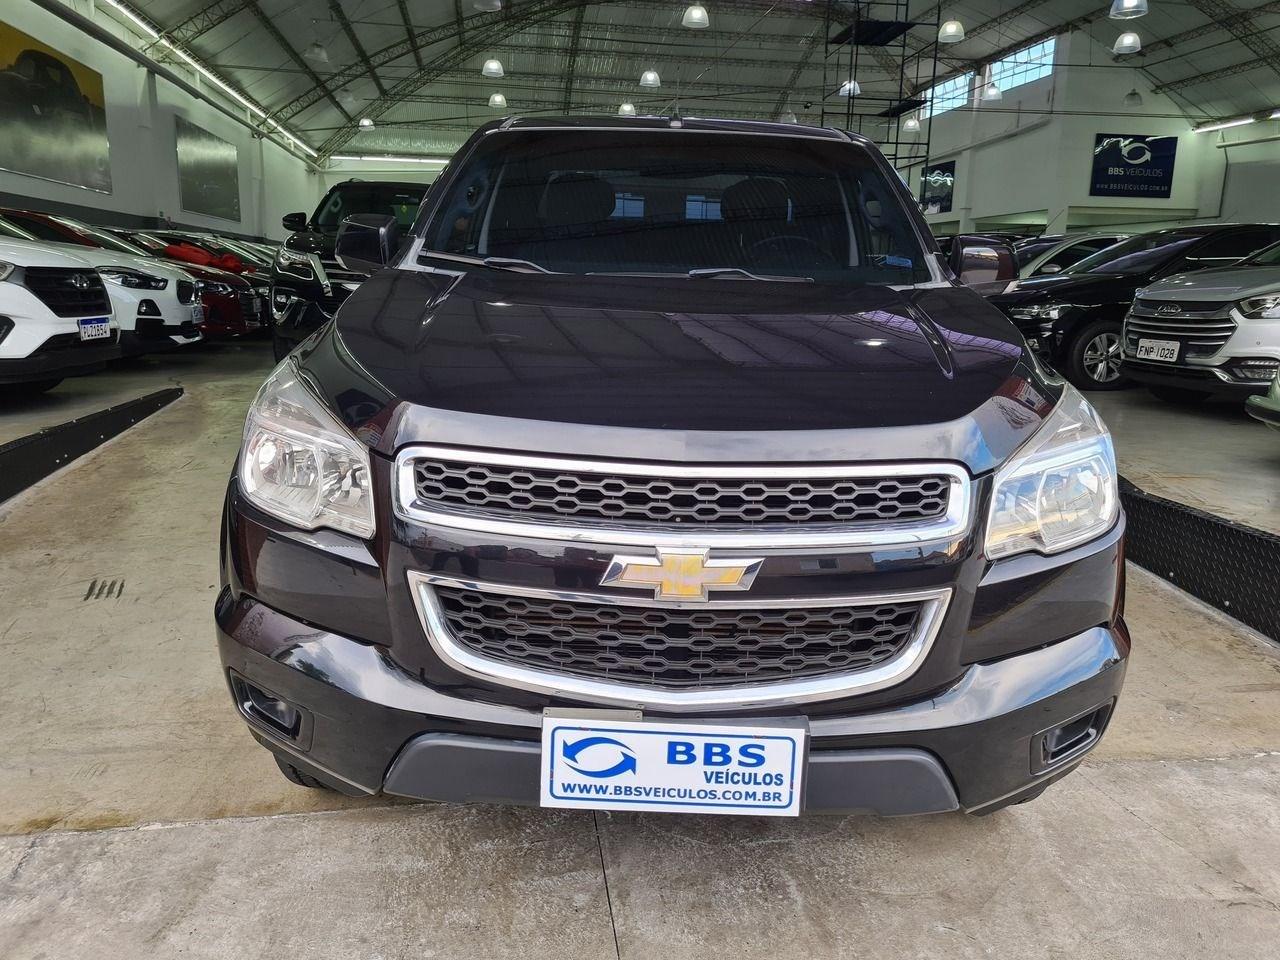 //www.autoline.com.br/carro/chevrolet/s-10-28-cd-lt-16v-diesel-4p-turbo-automatico/2015/sao-paulo-sp/13479801